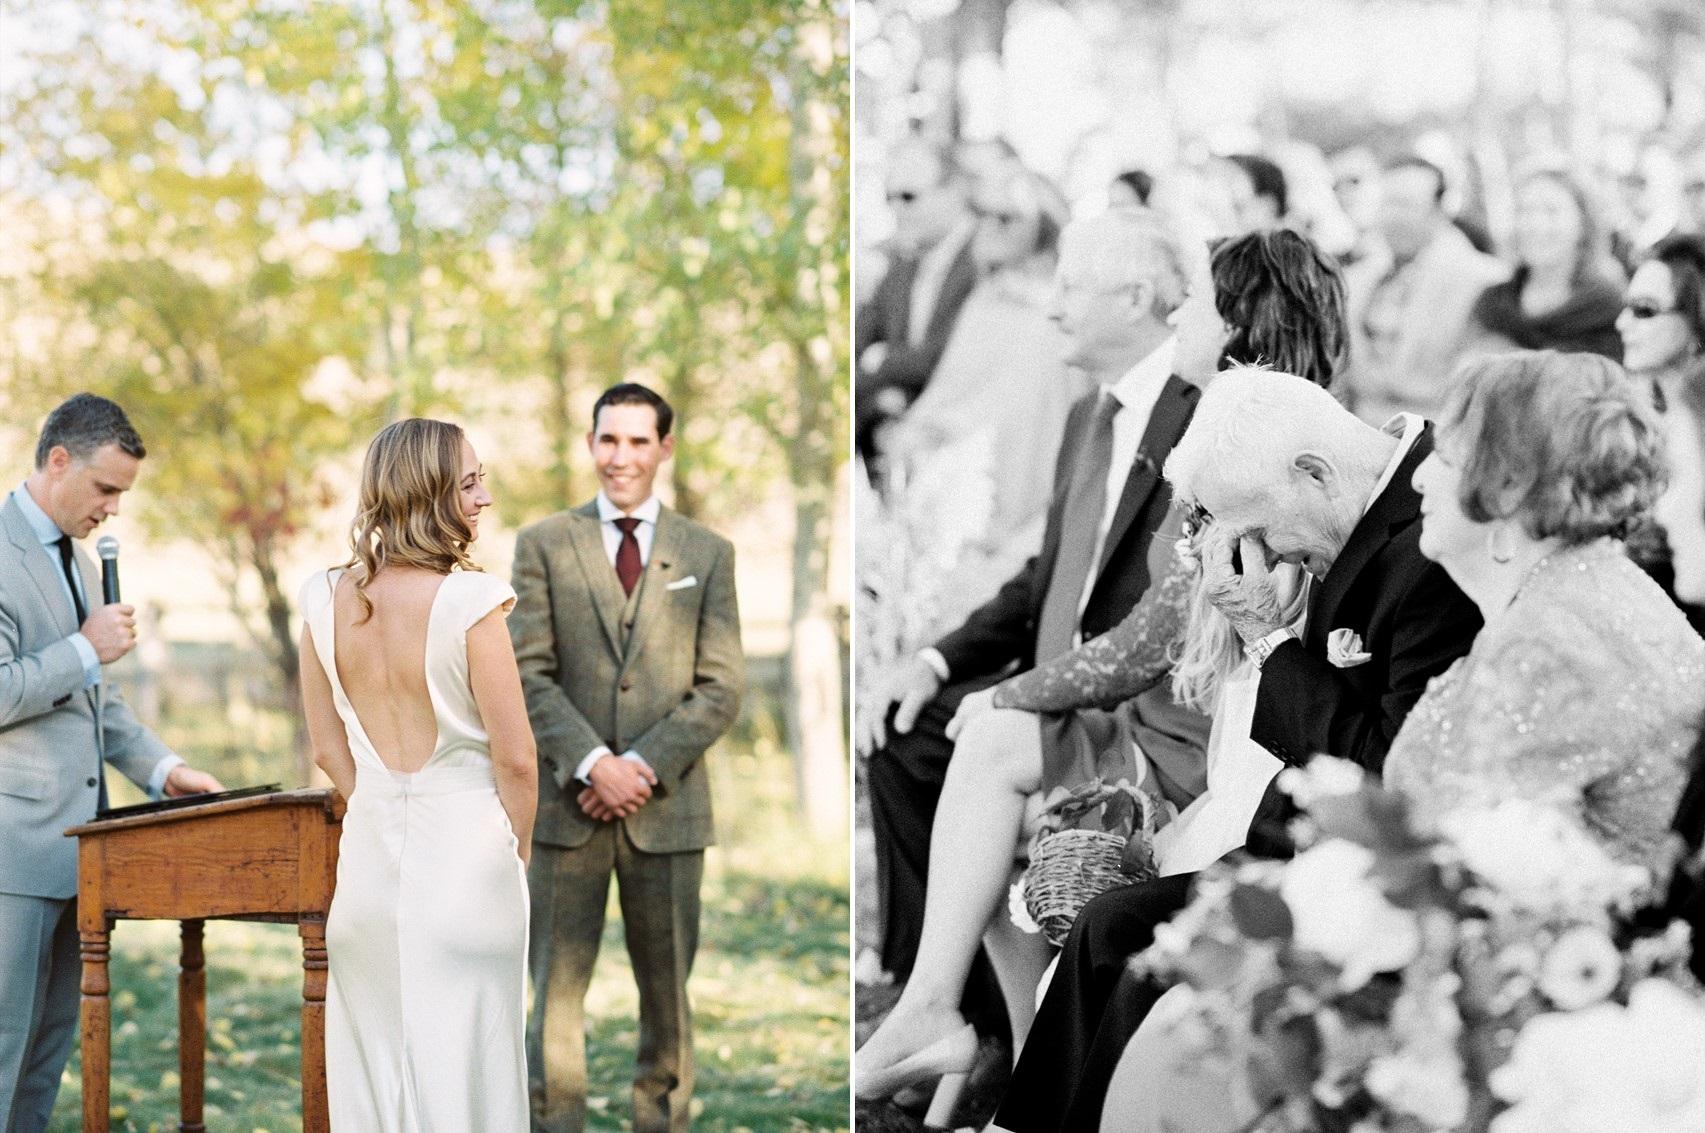 Fall Outdoor Wedding Ceremony